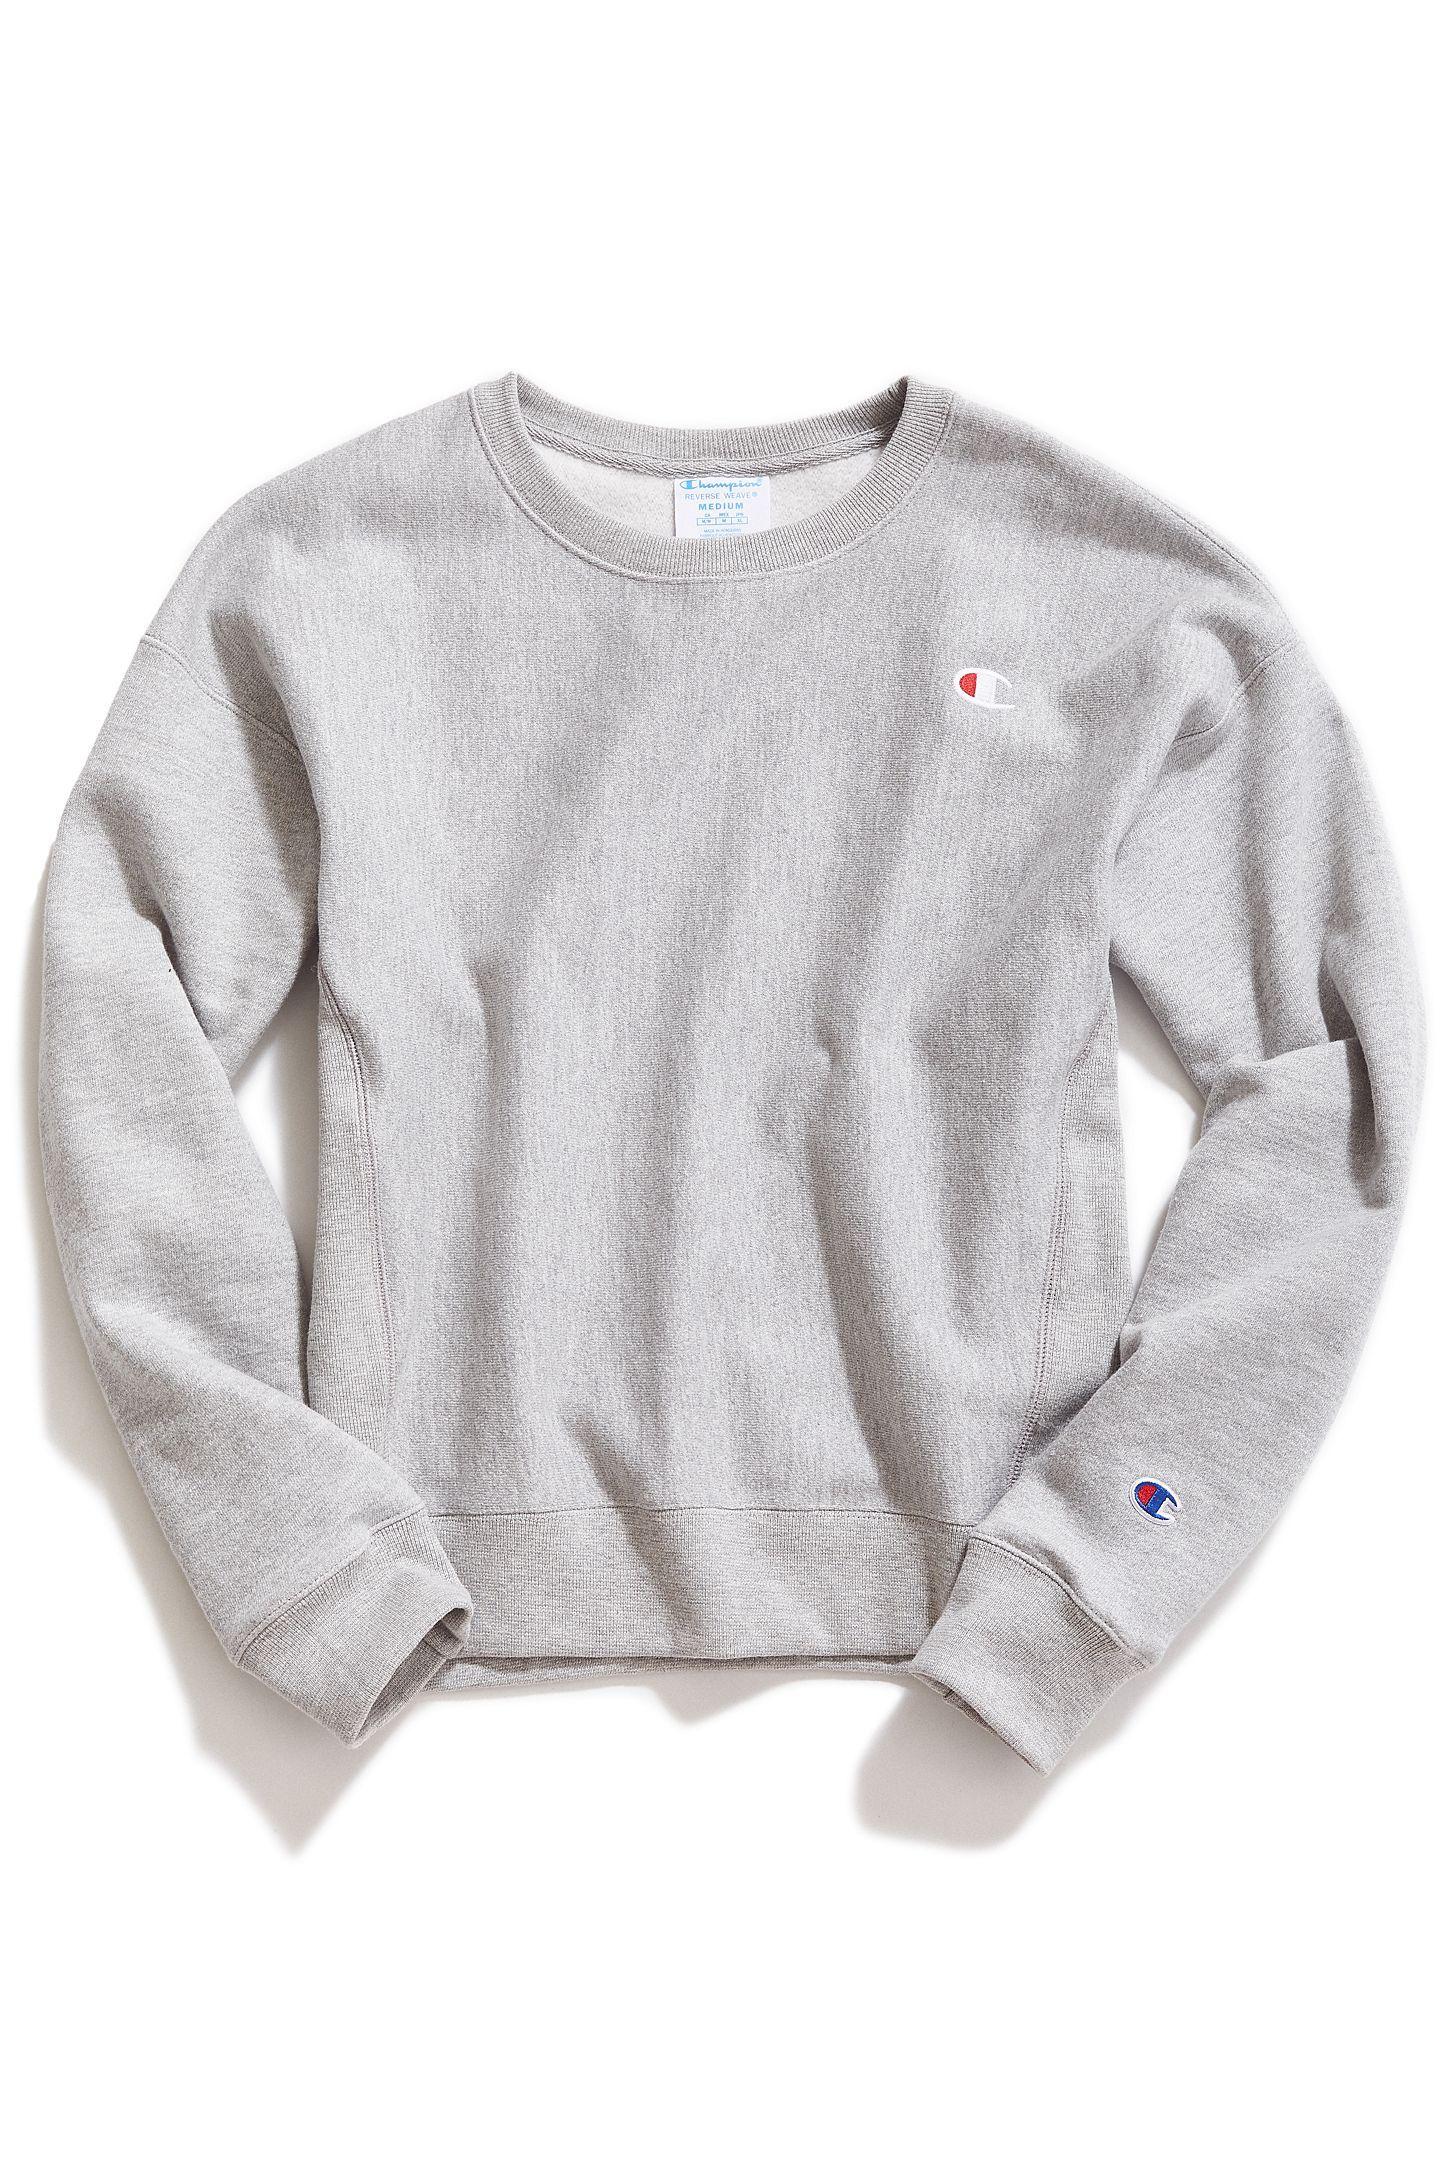 Champion Reverse Weave Logo Patch Sweatshirt Sweatshirts Patch Sweatshirts Grey Champion Sweatshirt [ 2175 x 1450 Pixel ]